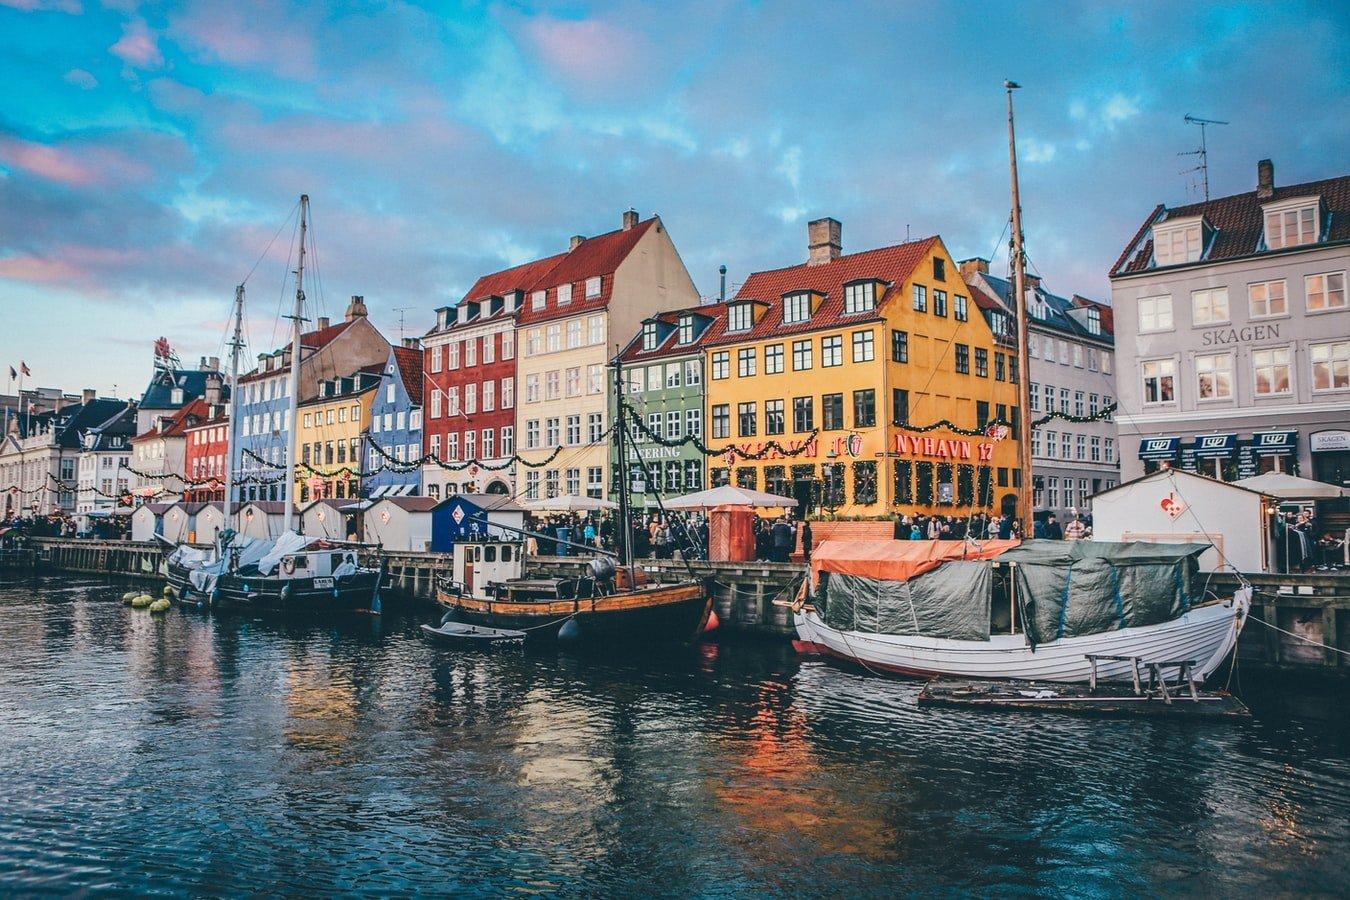 Nyhavn in Kopenhagen Dänemark